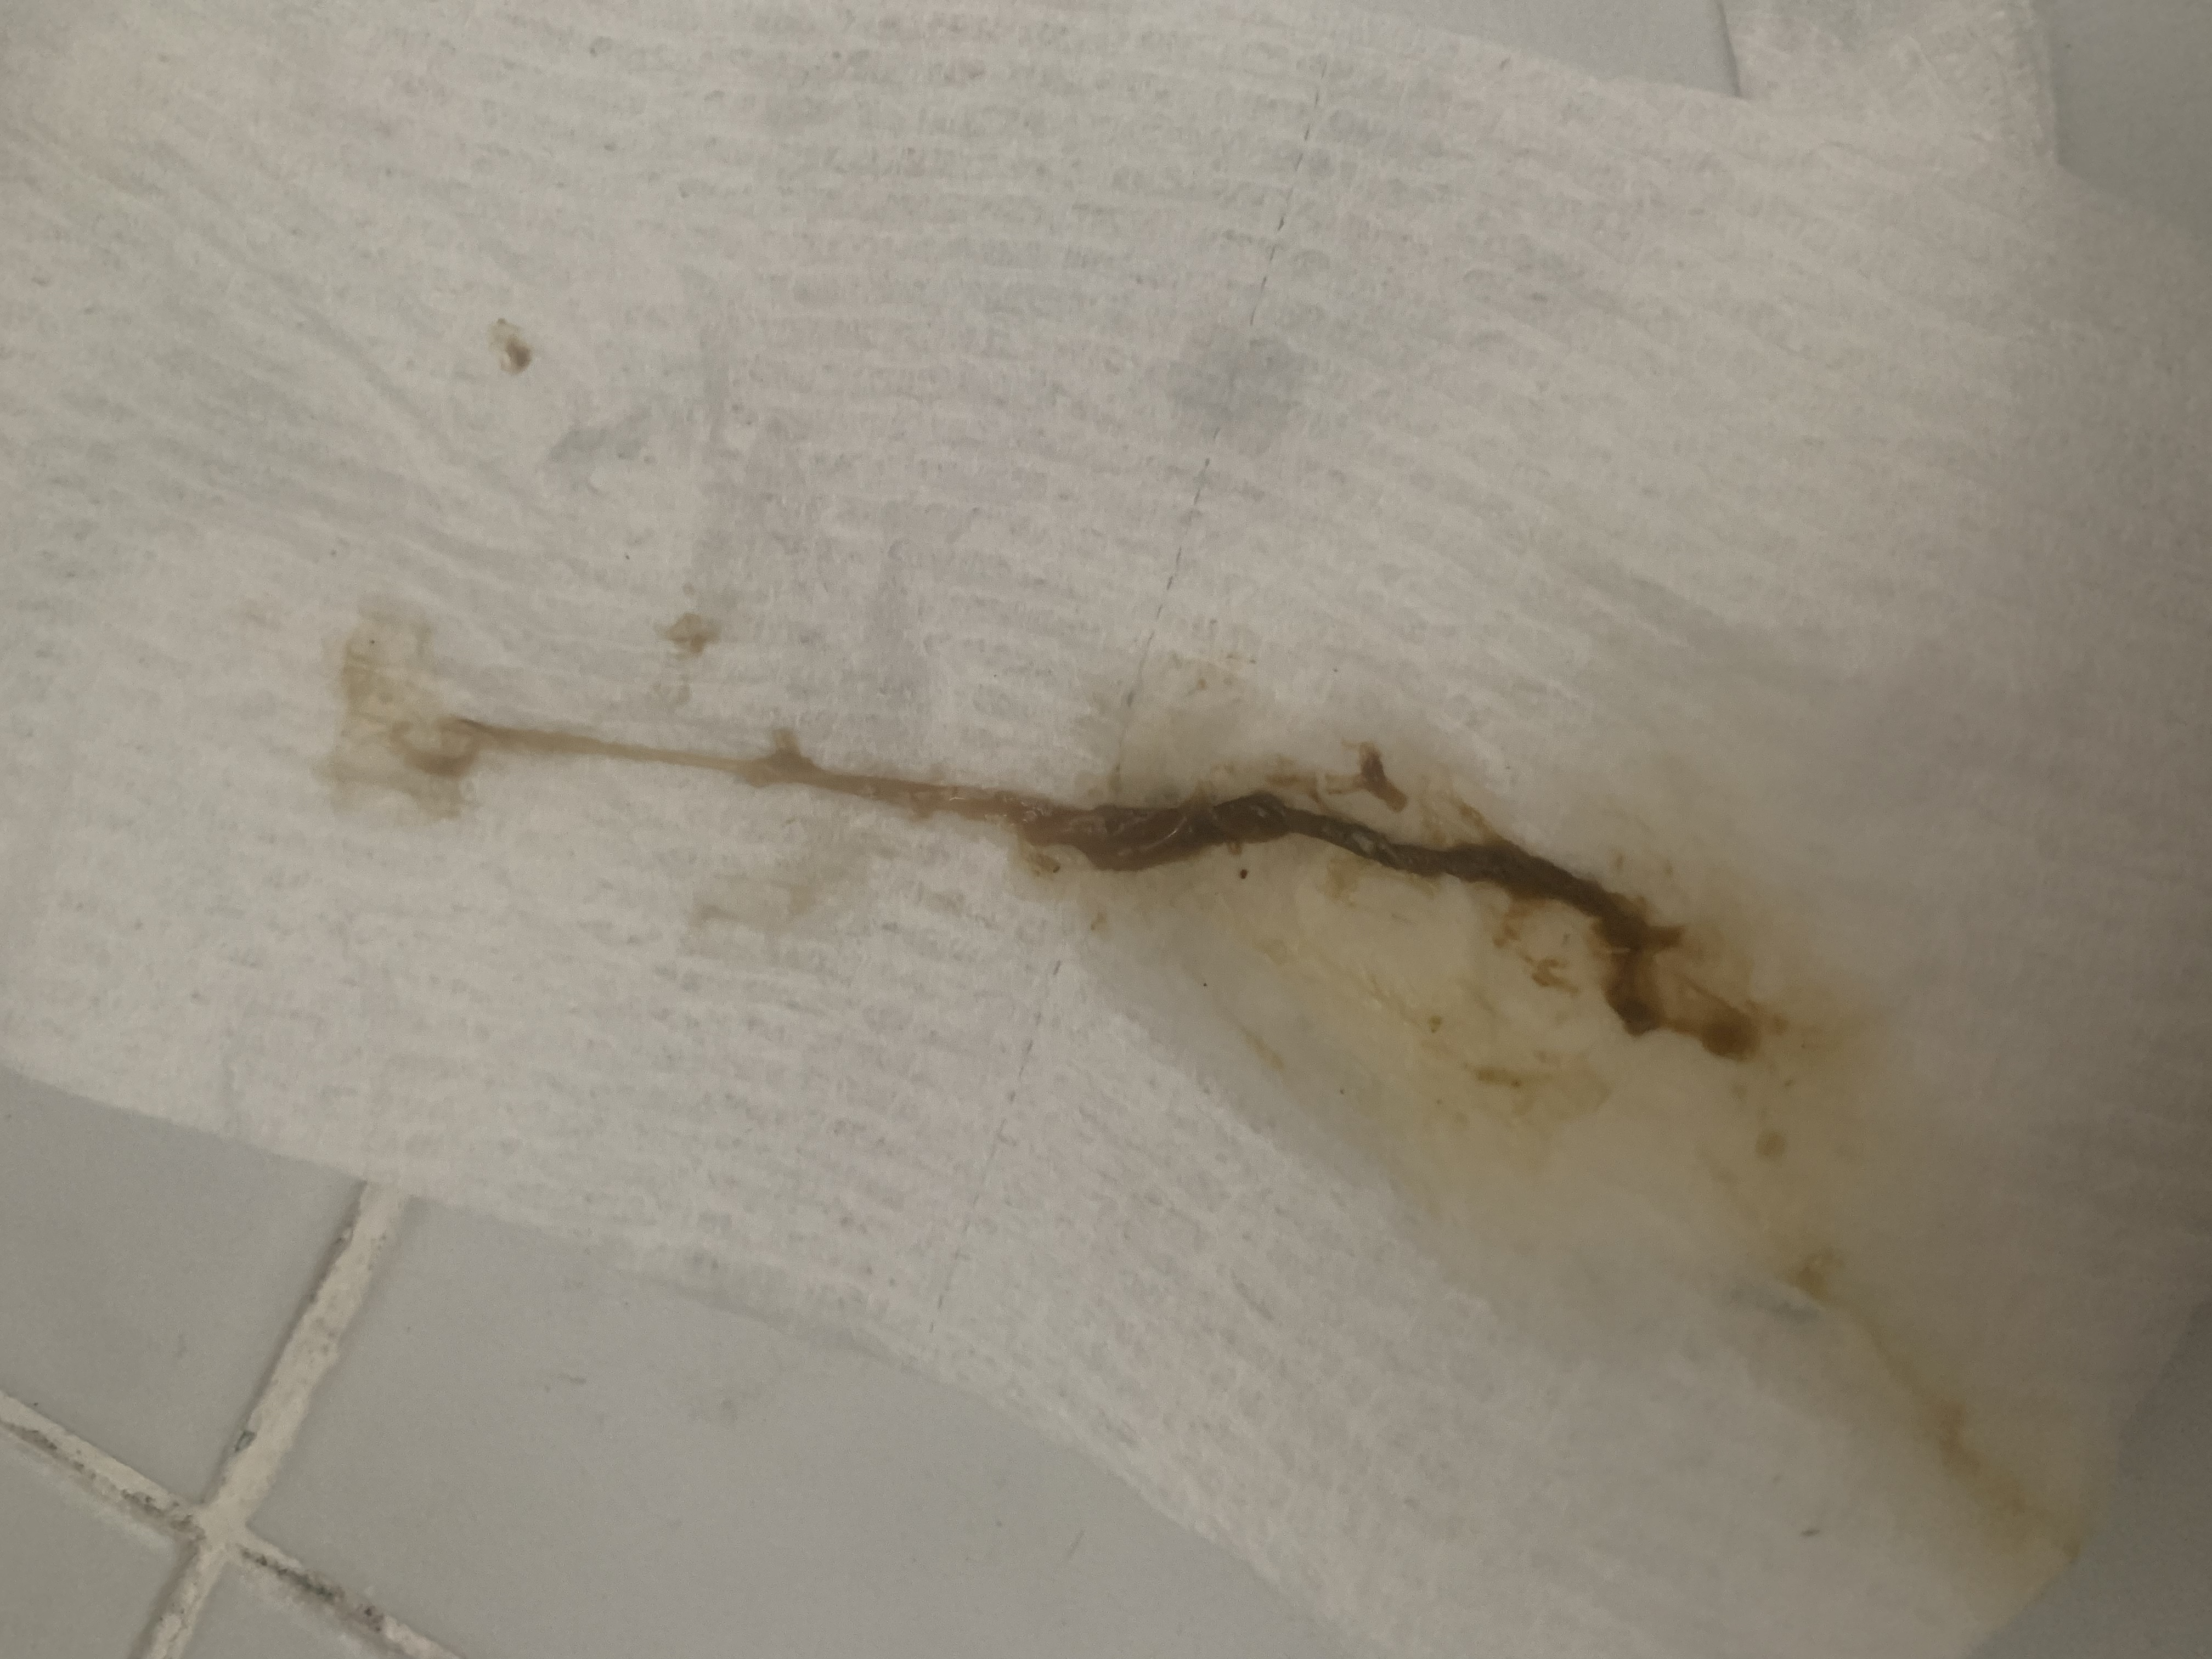 https://www.curezone.org/upload/Parasites/9375A1D8_946F_41D7_A679_A5FB707C6660.jpeg